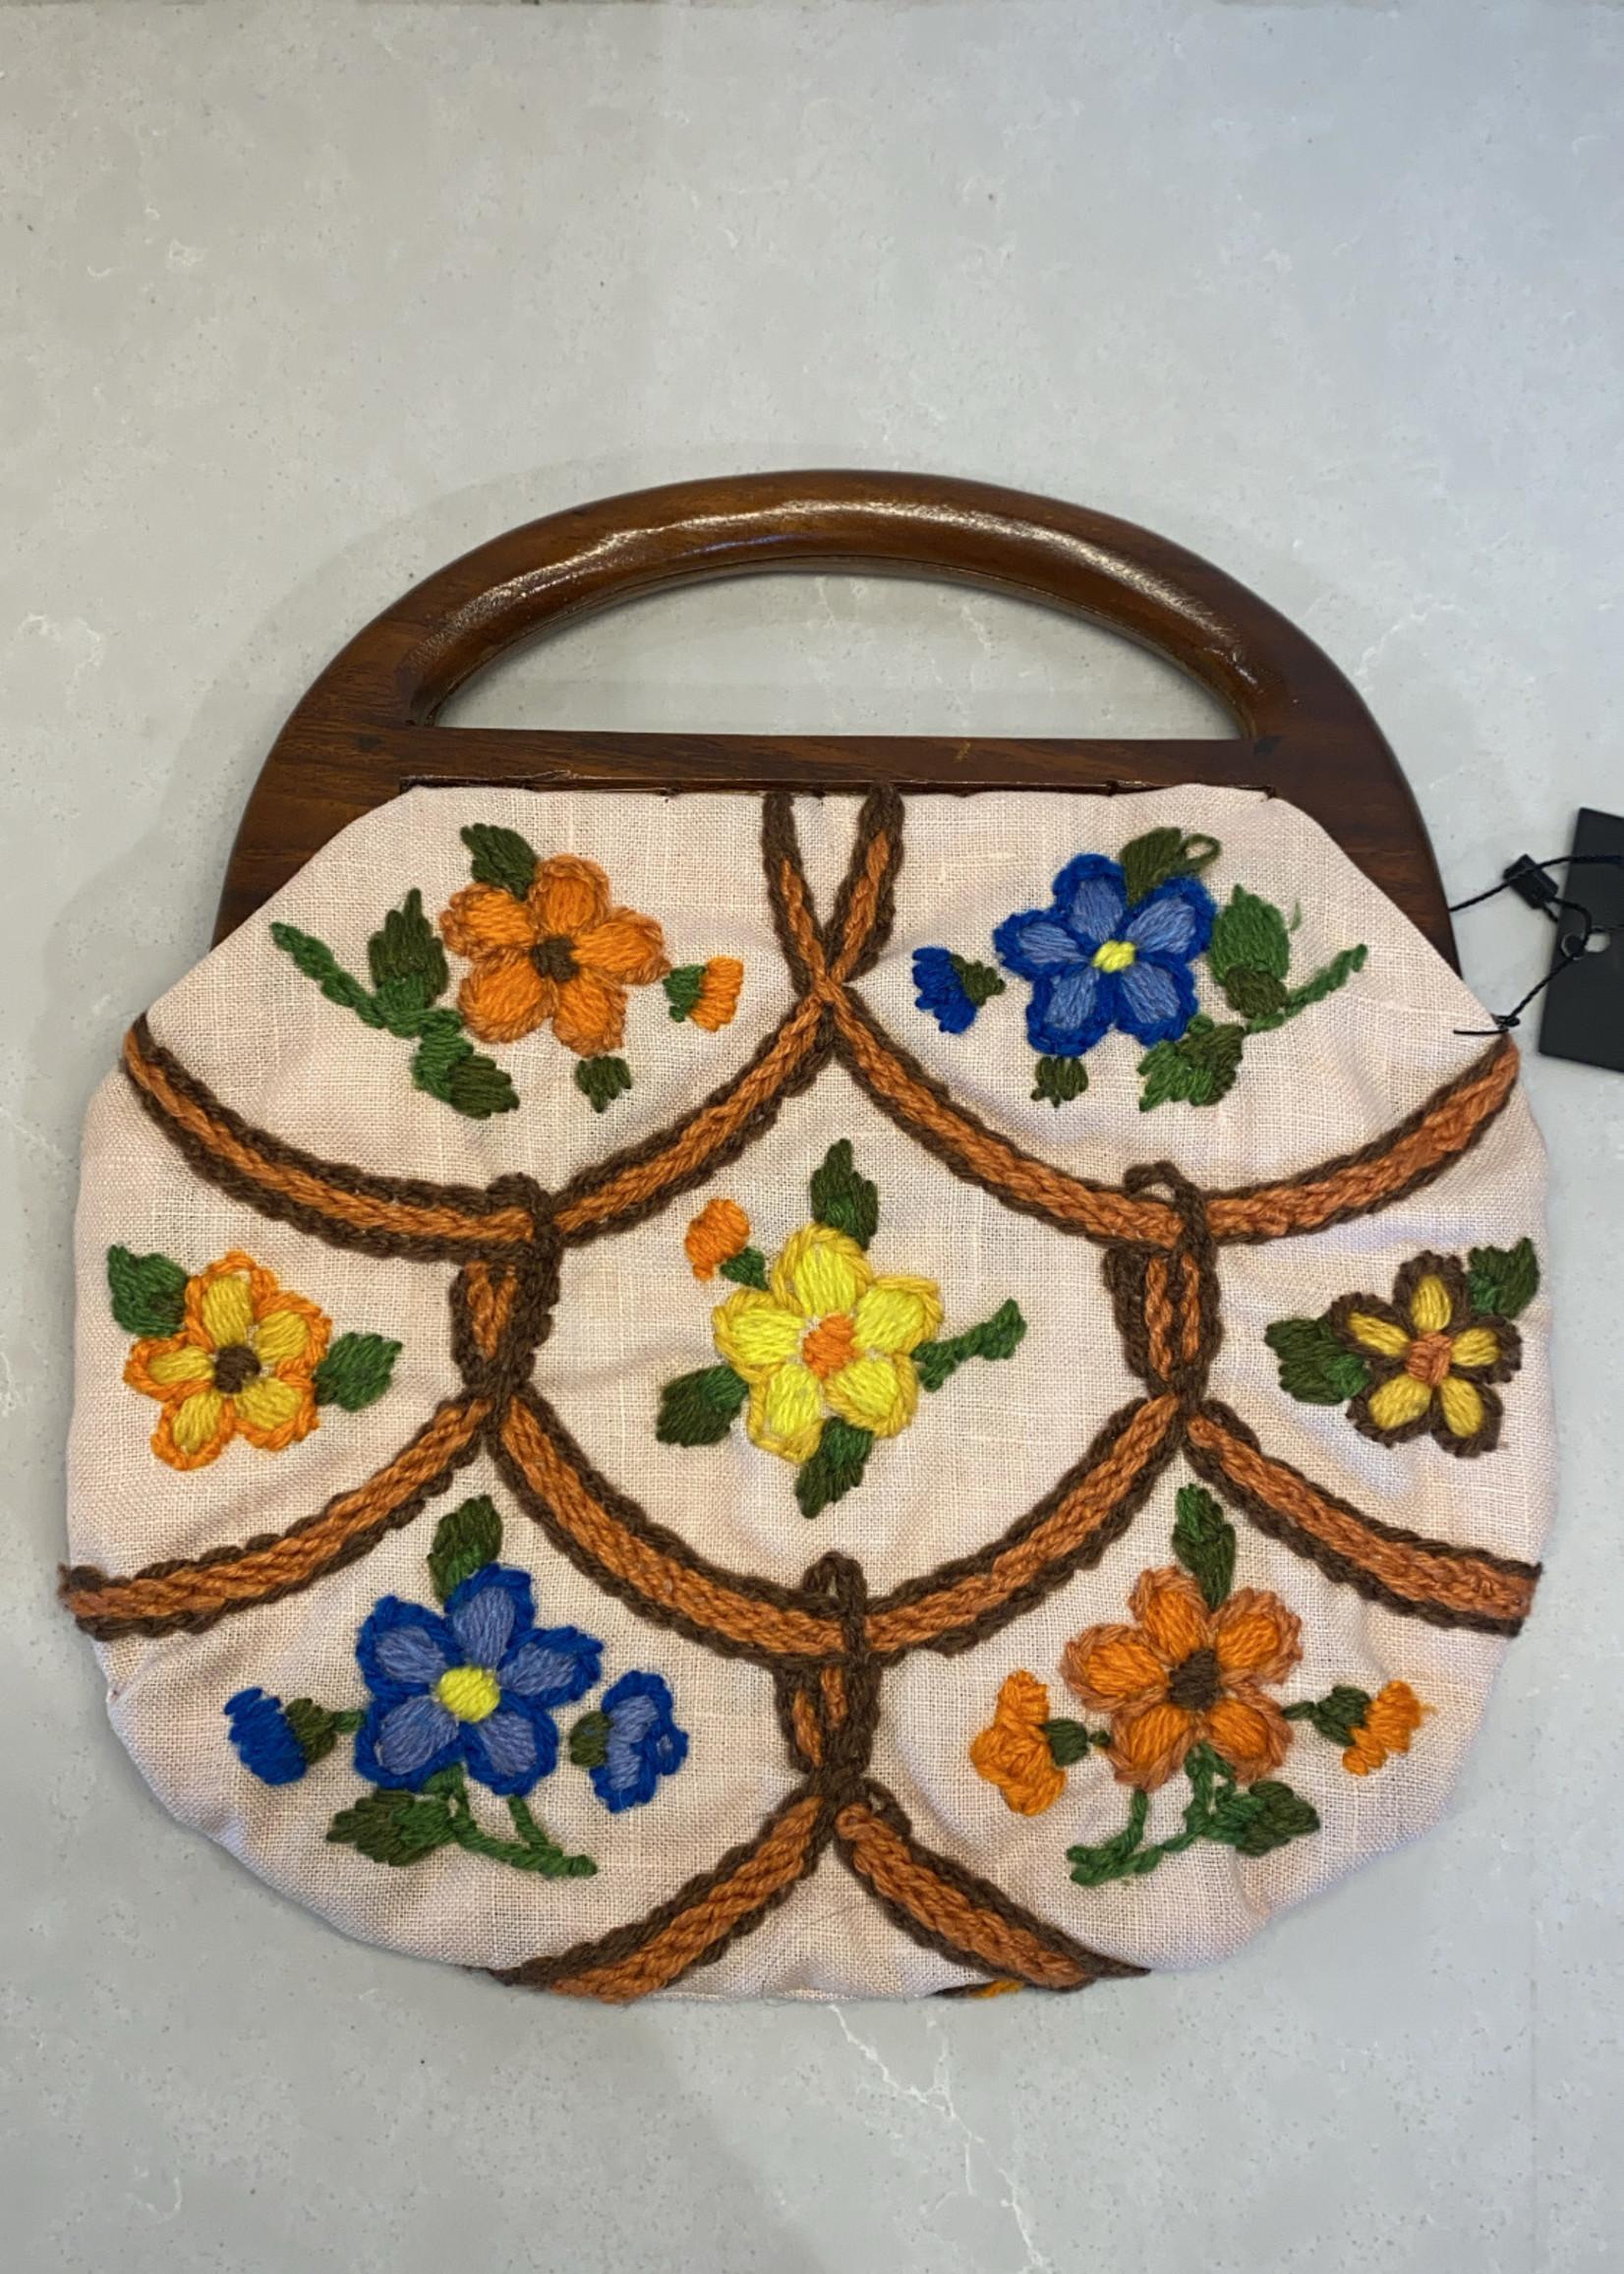 Vintage '60s White Knit Handbag with Wood Handle